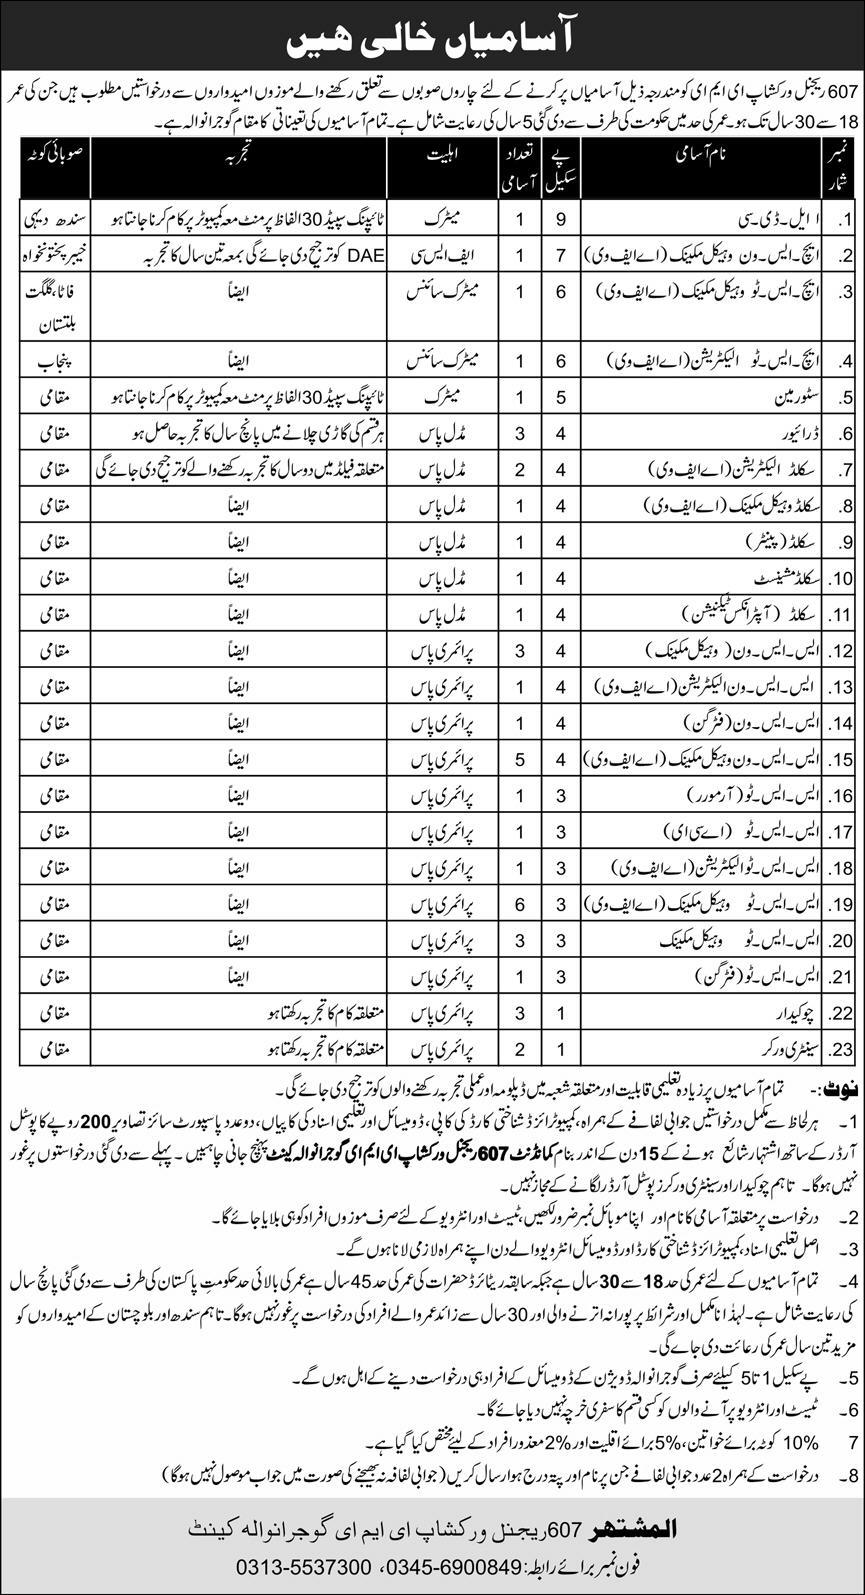 Pak Army Civilian Jobs September 2020